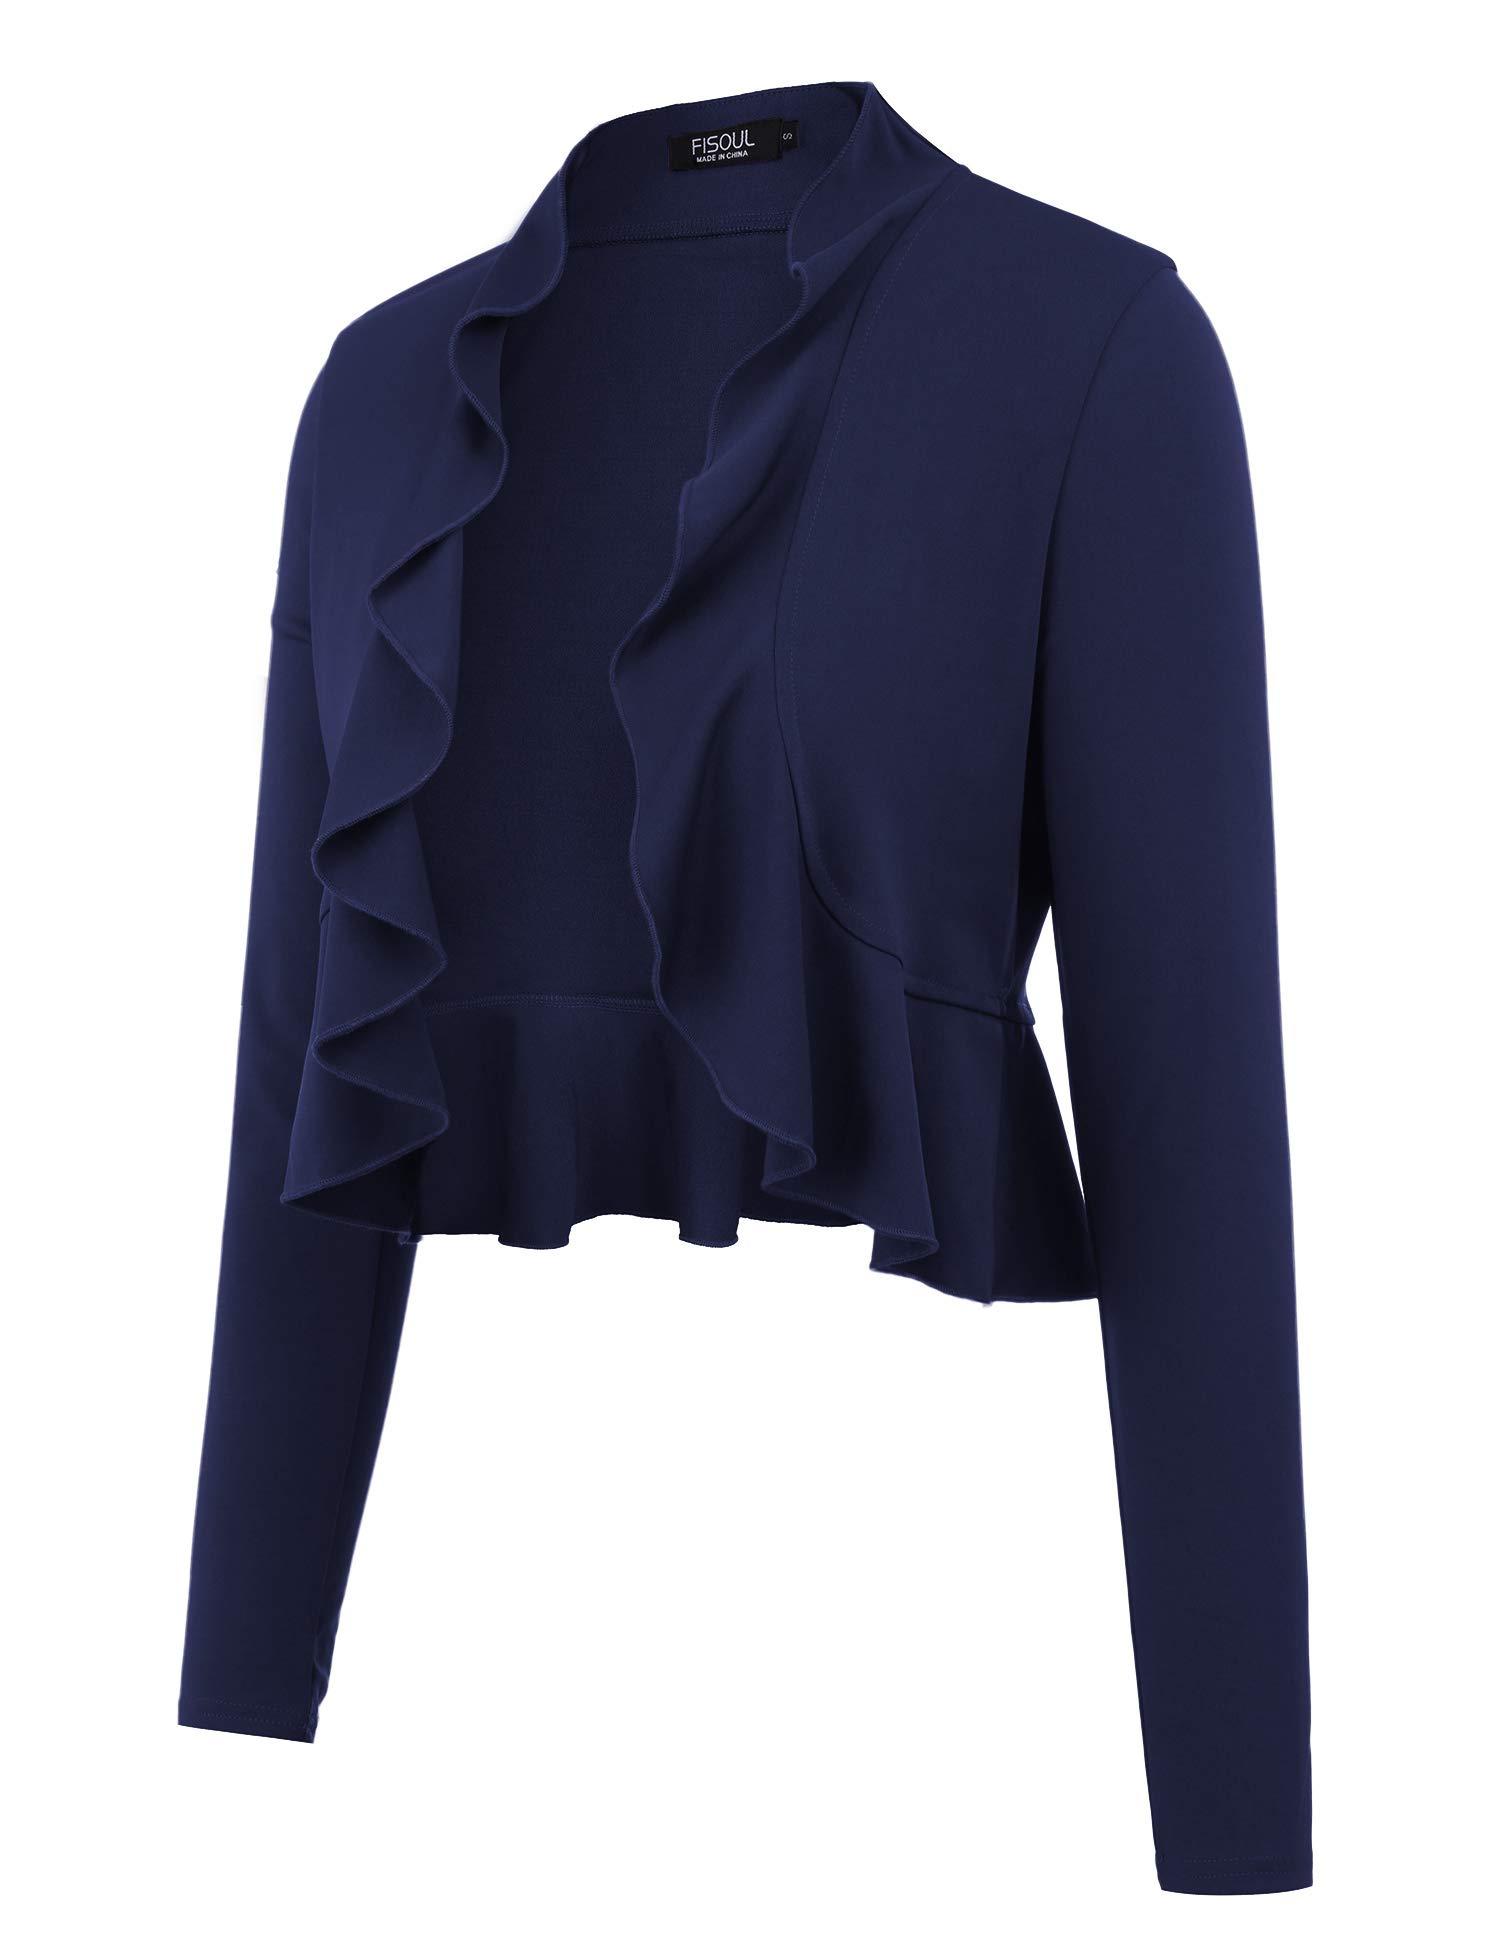 FISOUL Women's Open Front Cropped Cardigan Lone Sleeve Casual Shrugs Jacket Draped Ruffles Lightweight Sweaters Navy Blue S